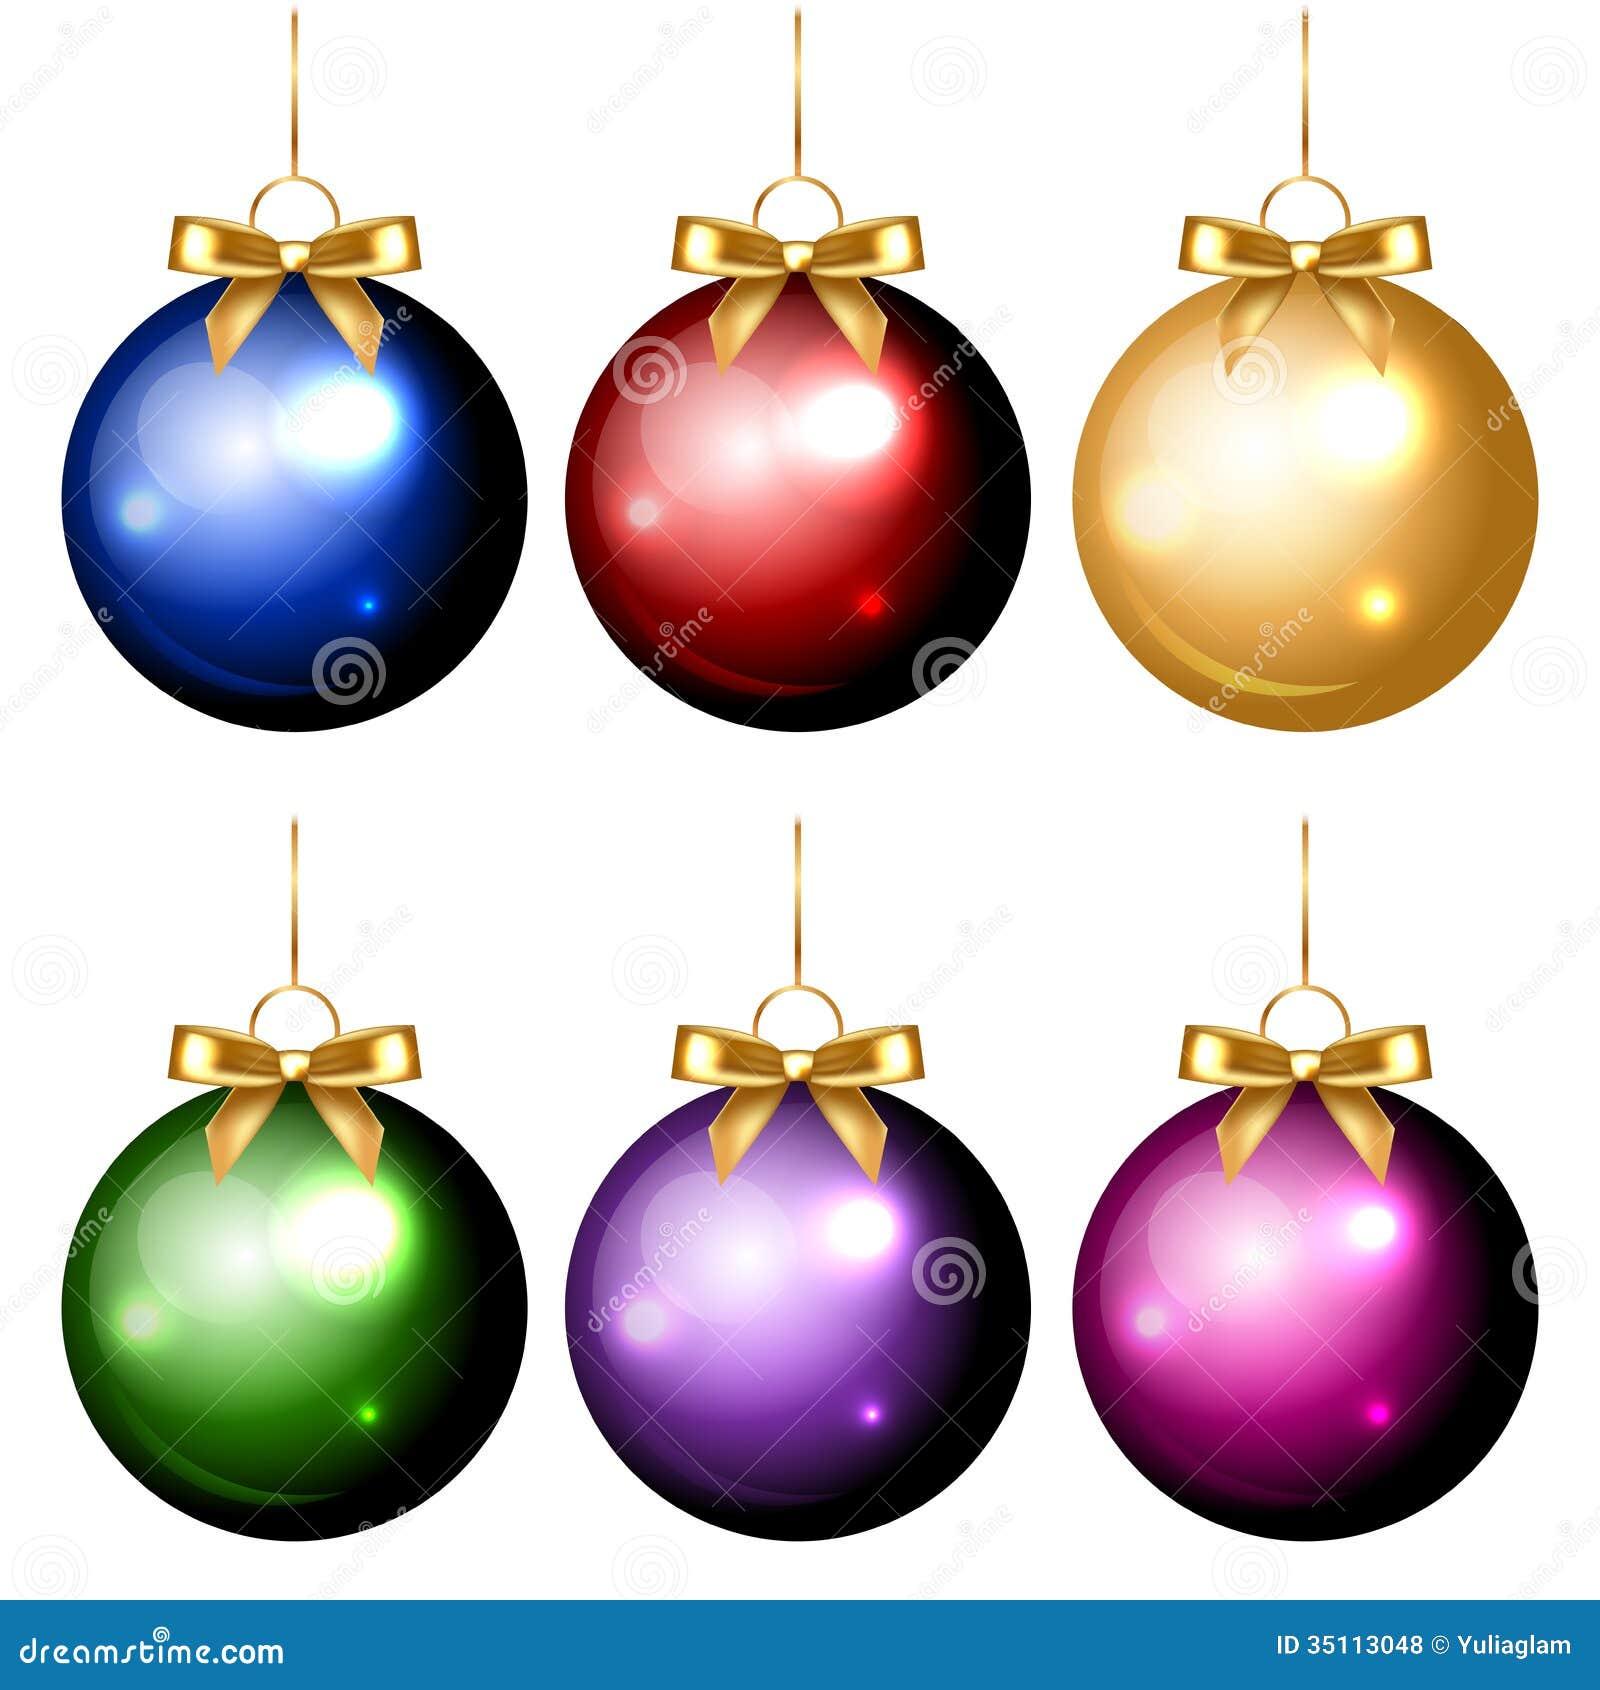 Christmas Holiday Clip Art 4